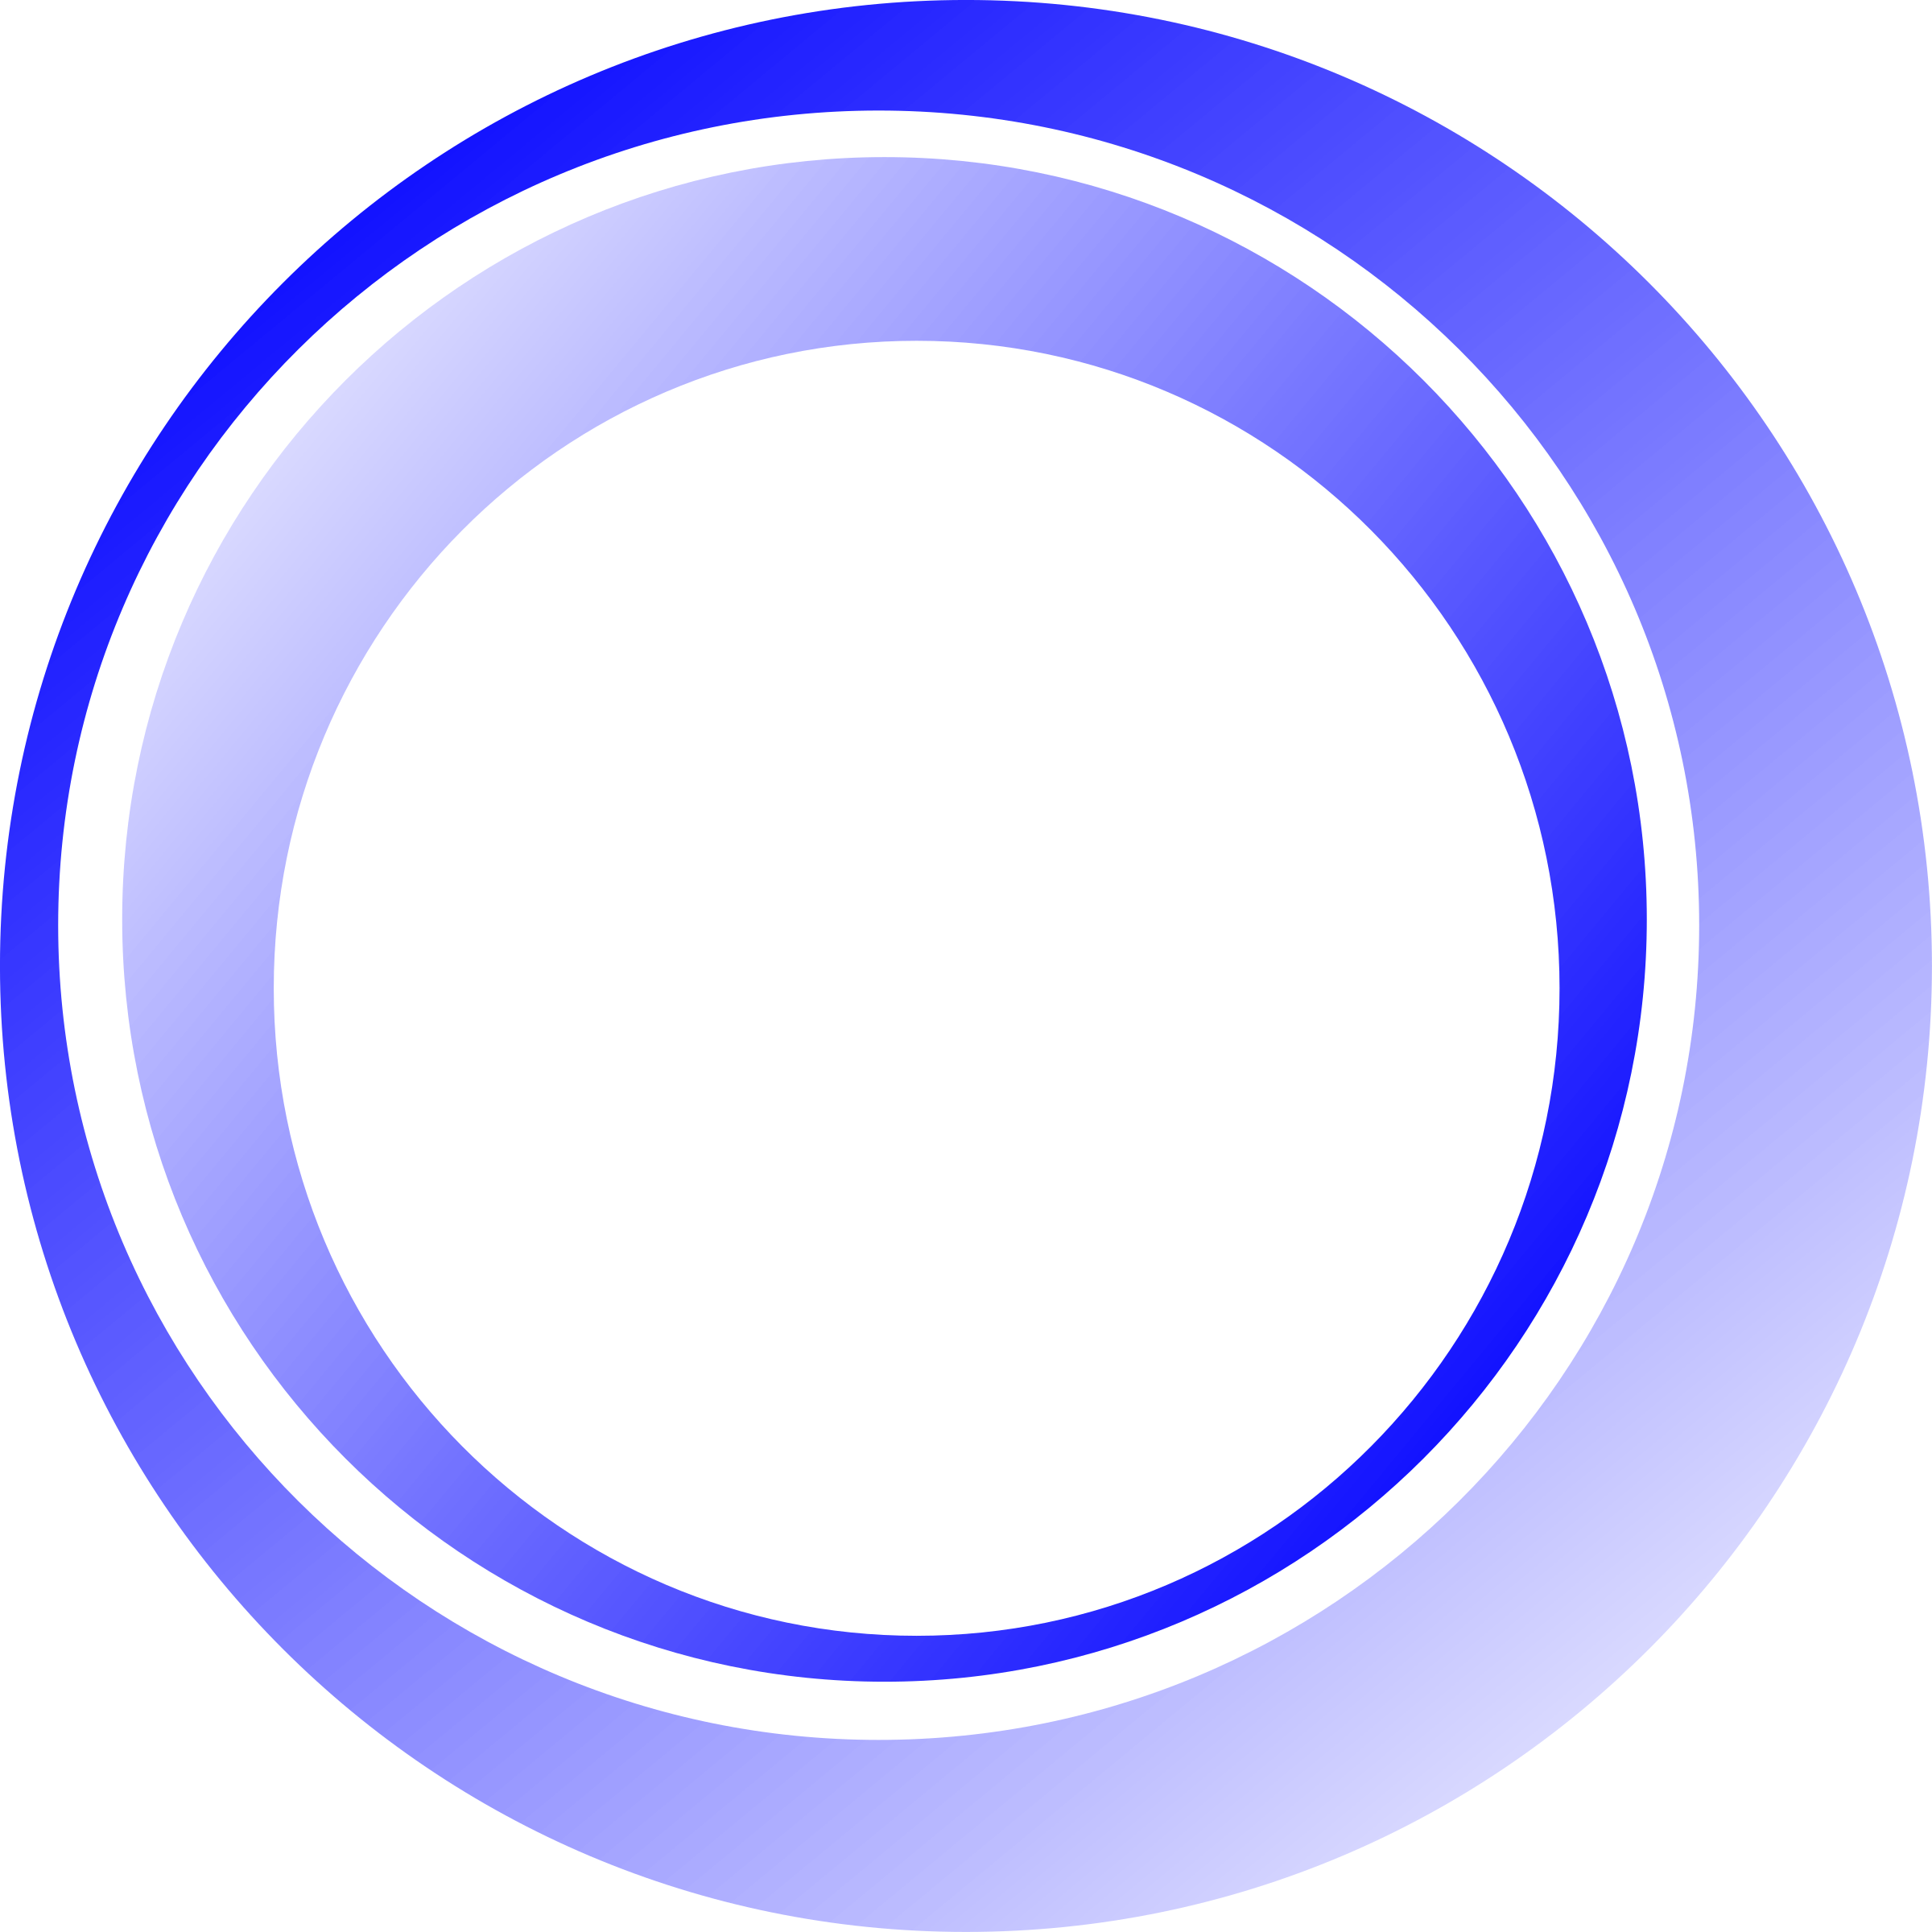 3D Blue Circle Png #44652.